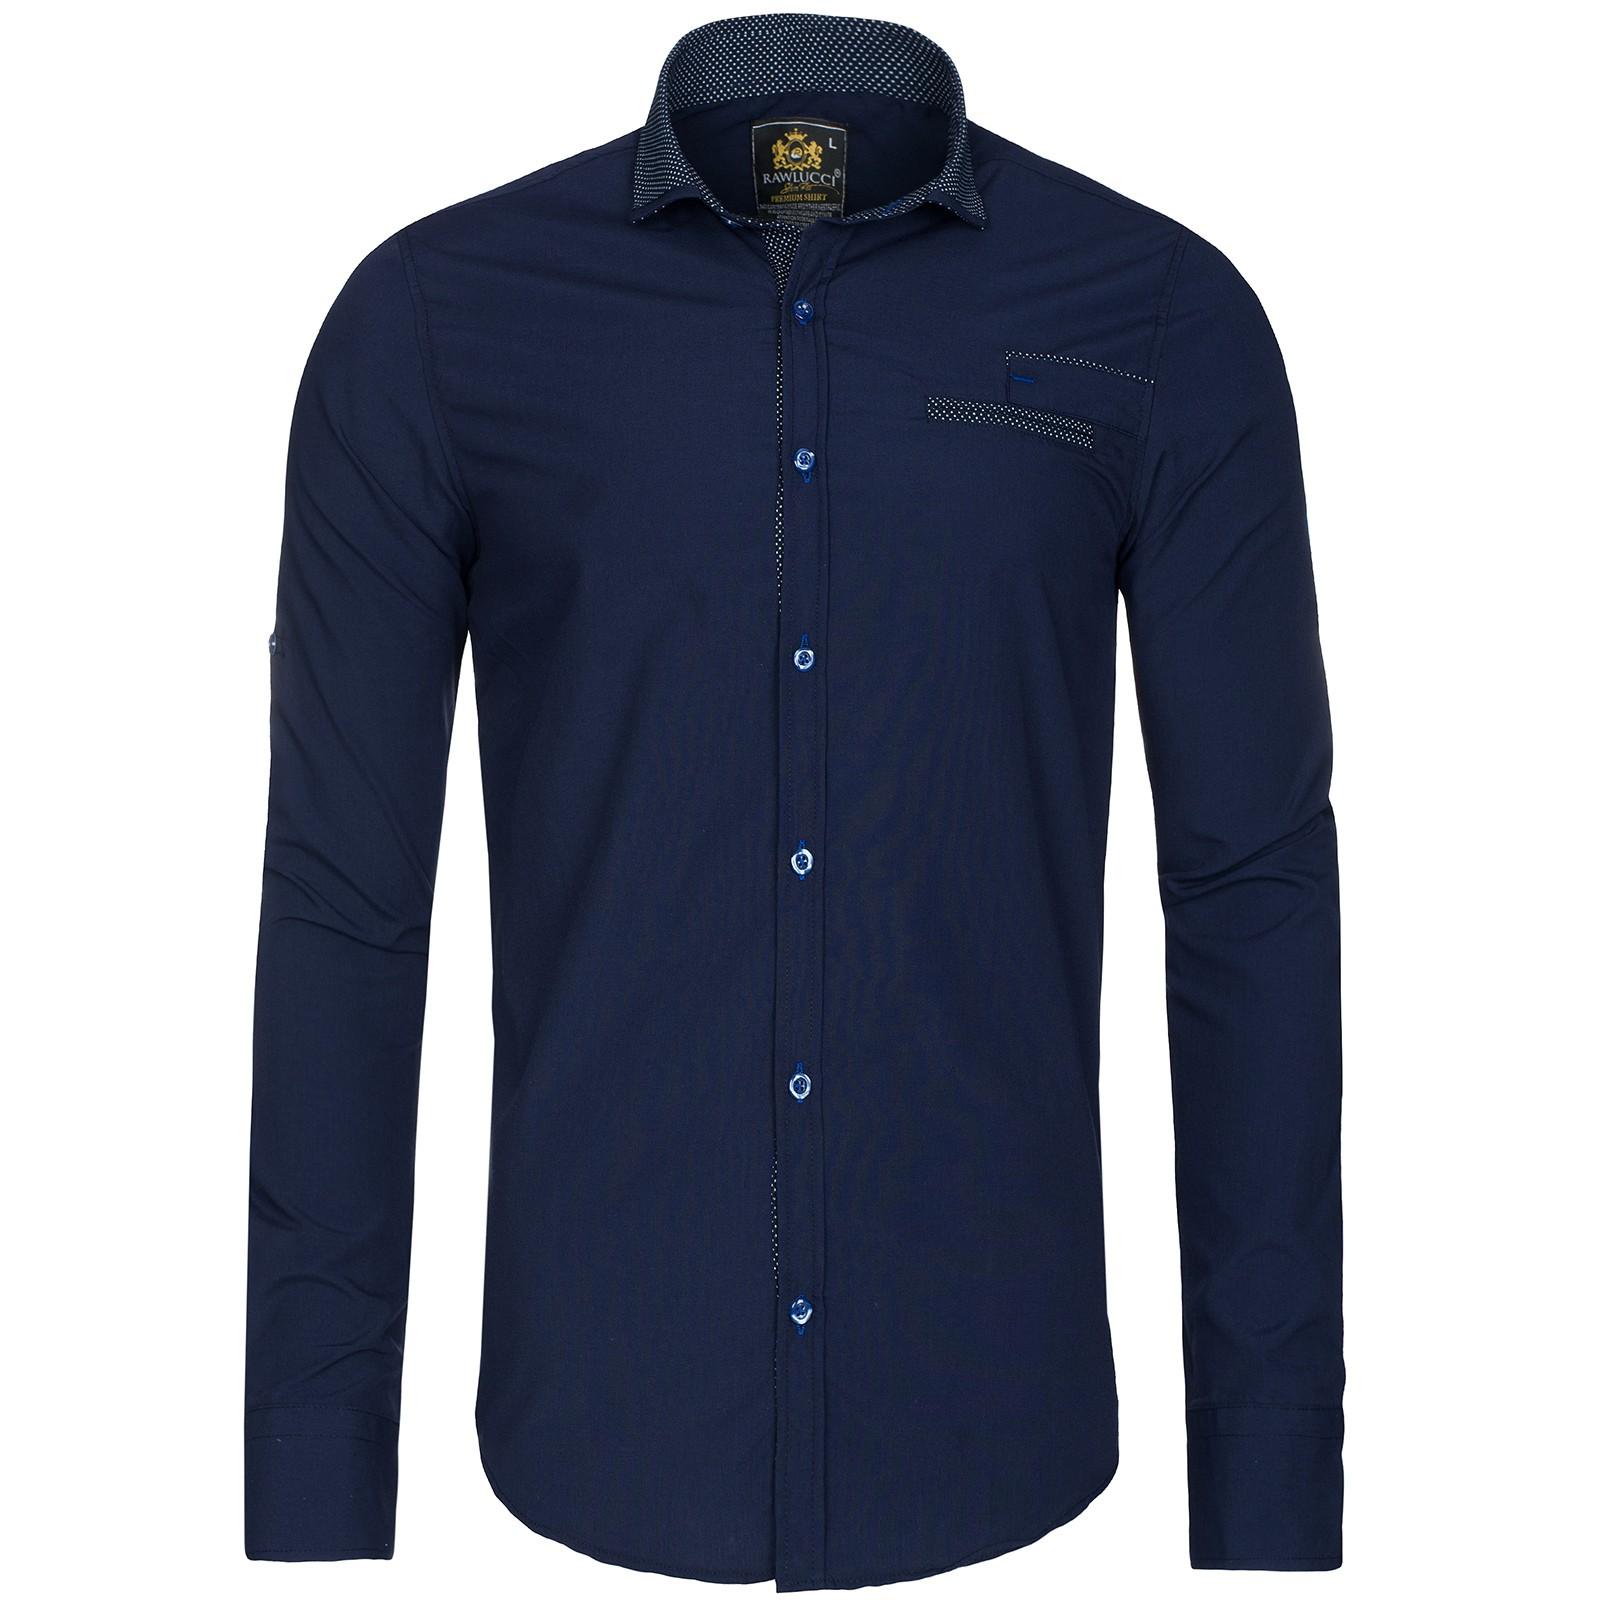 ozonee herren hemd freizeithemd business shirt casual. Black Bedroom Furniture Sets. Home Design Ideas